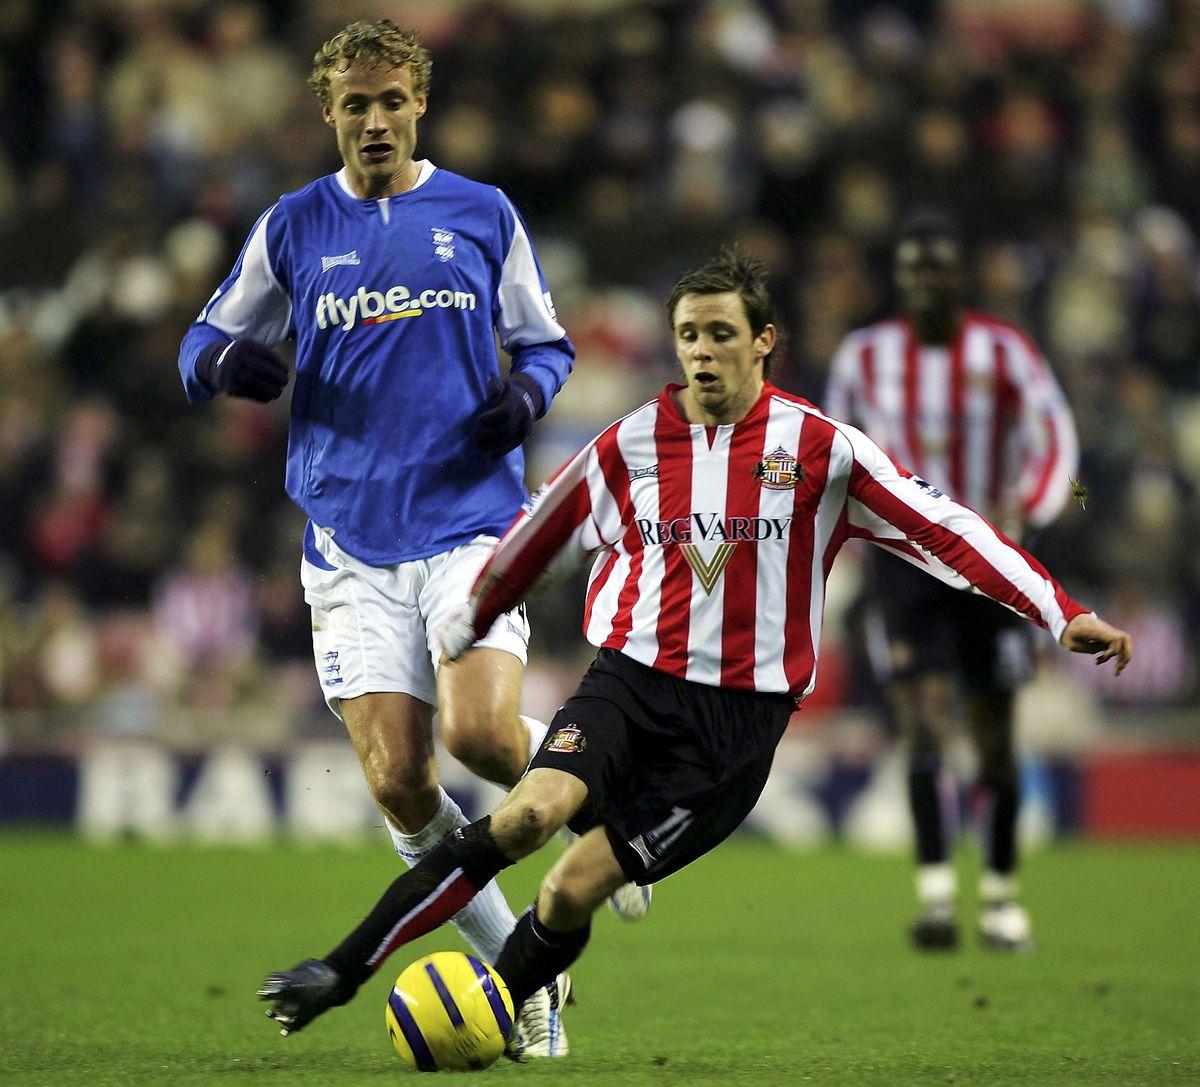 Sunderland v Birmingham City